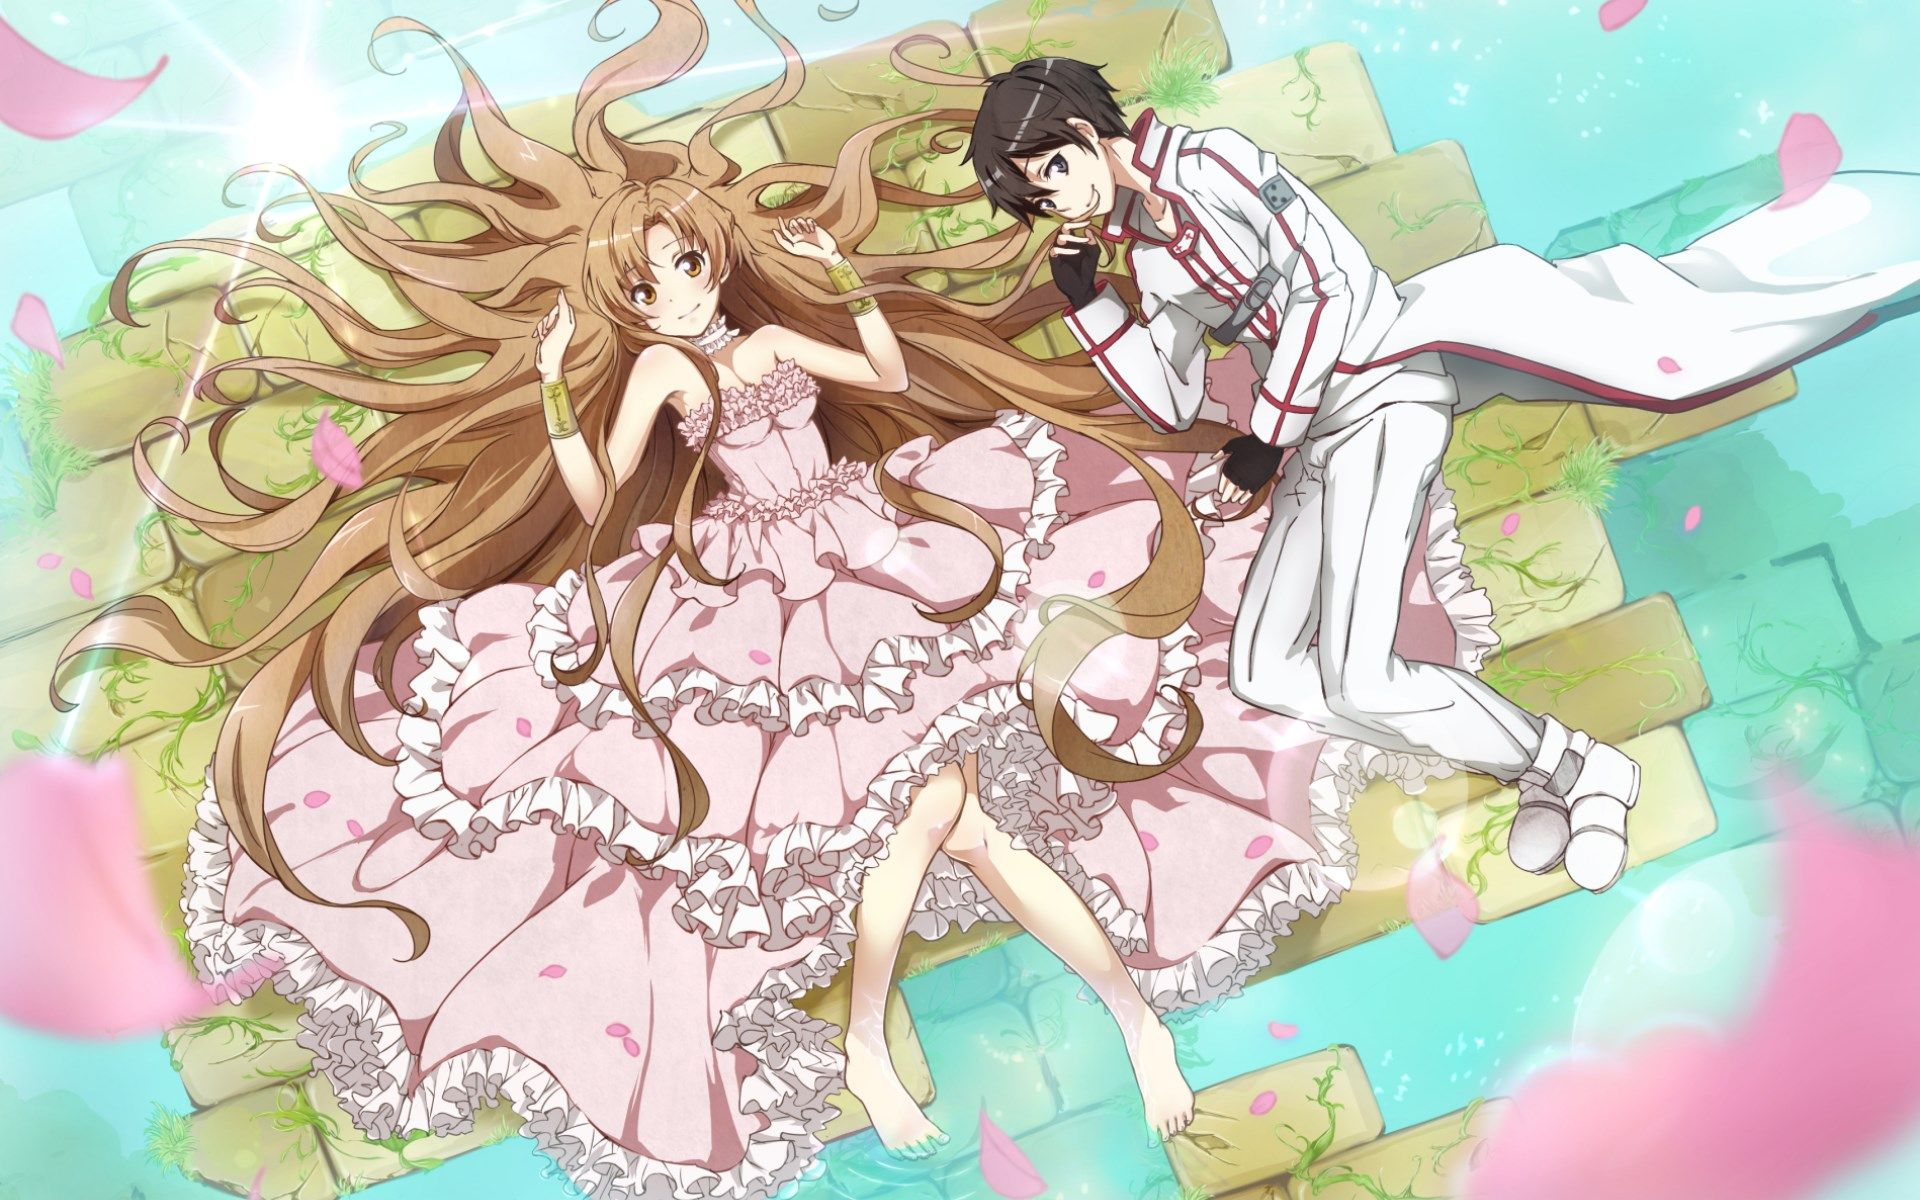 Asuna and Kirito | Sword art online | Pinterest | Kirito, Sword art ...